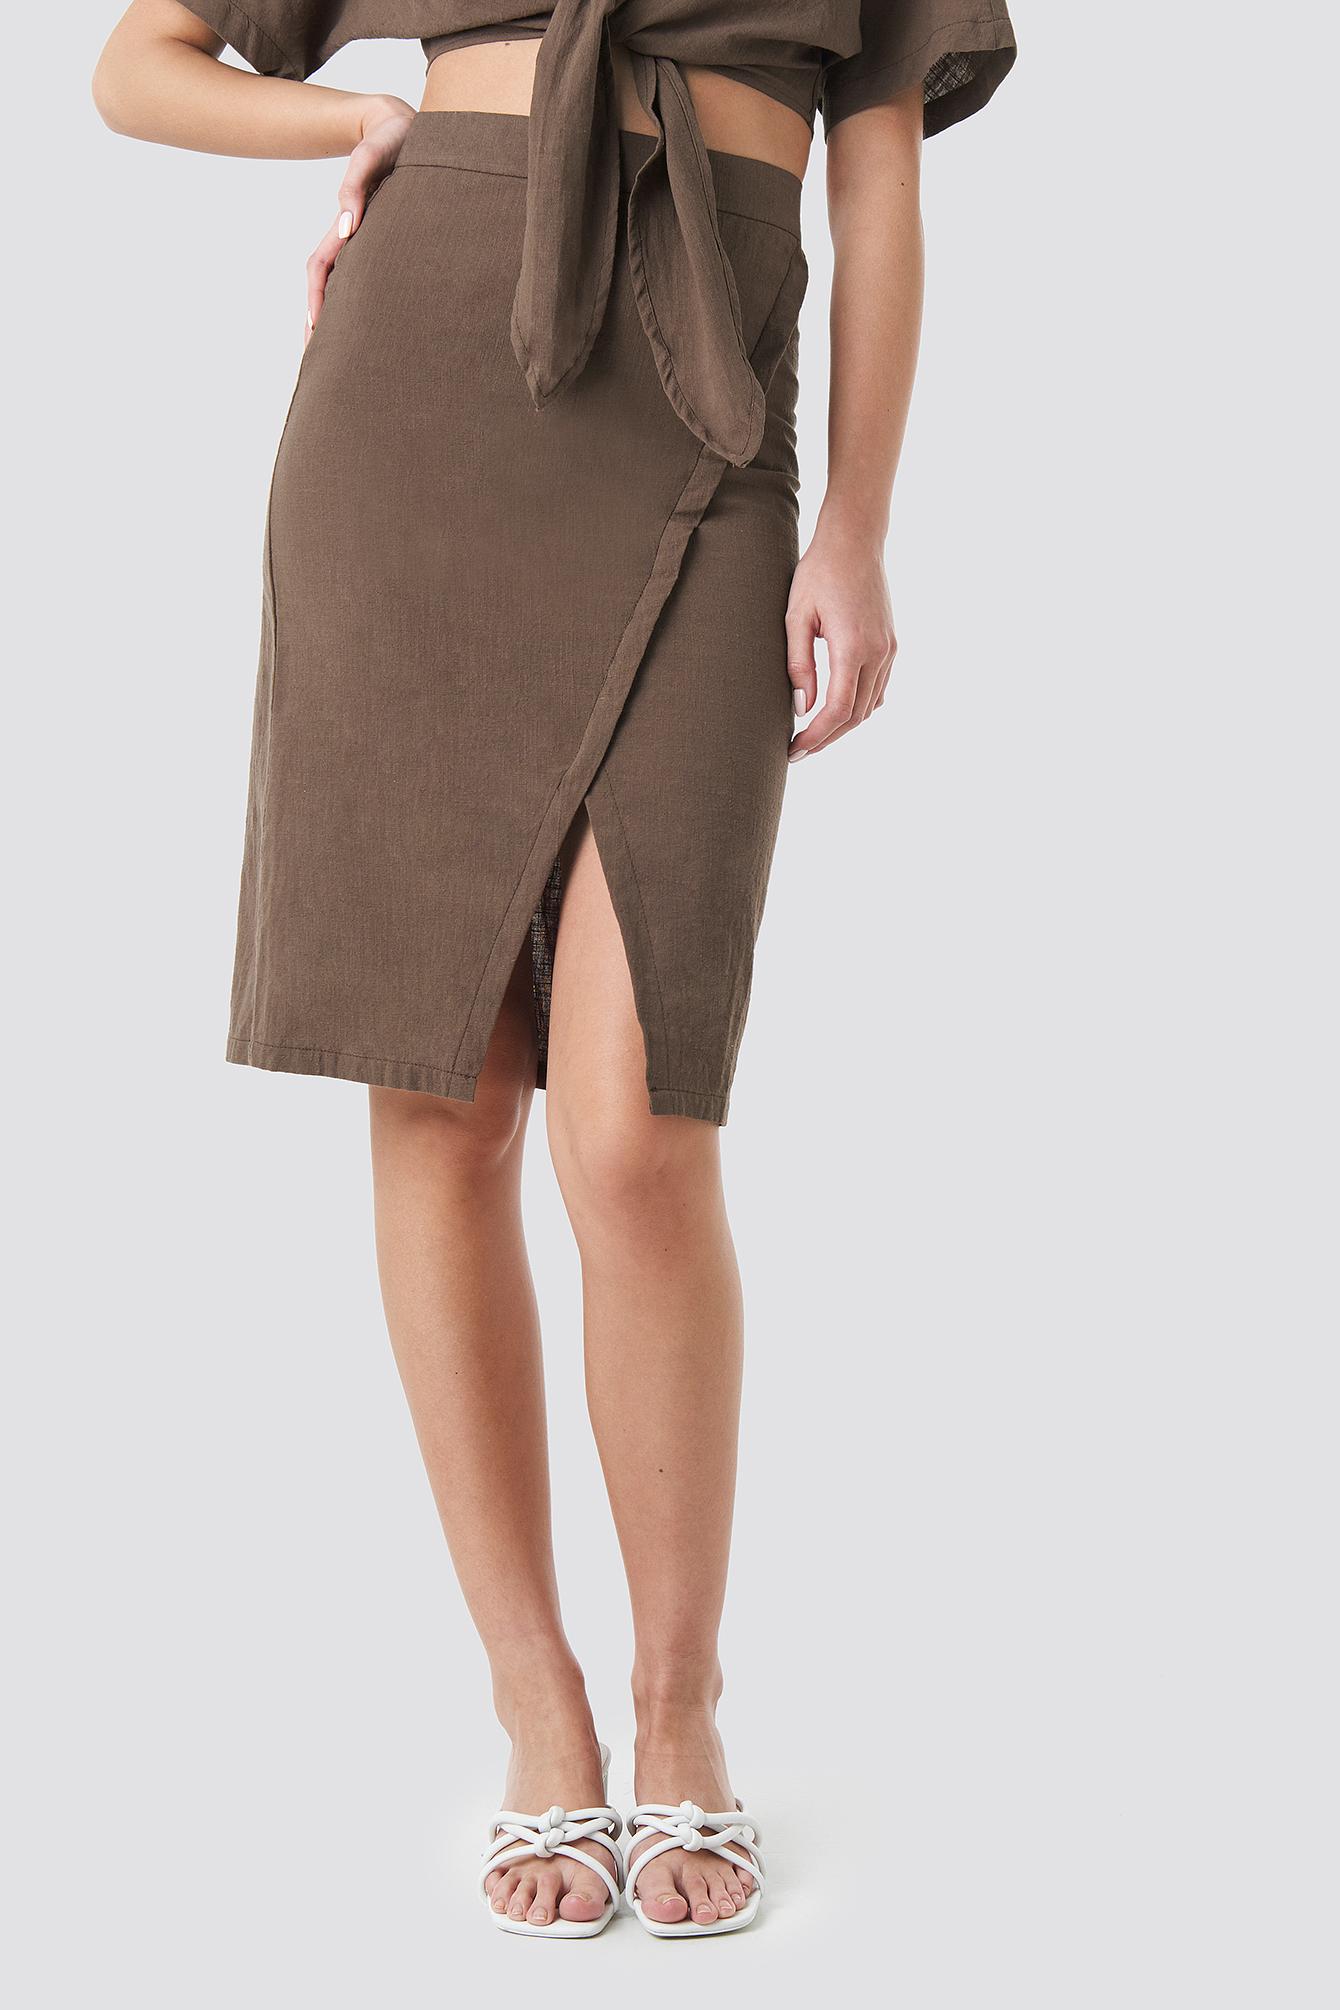 Overlap Linen Look Skirt NA-KD.COM